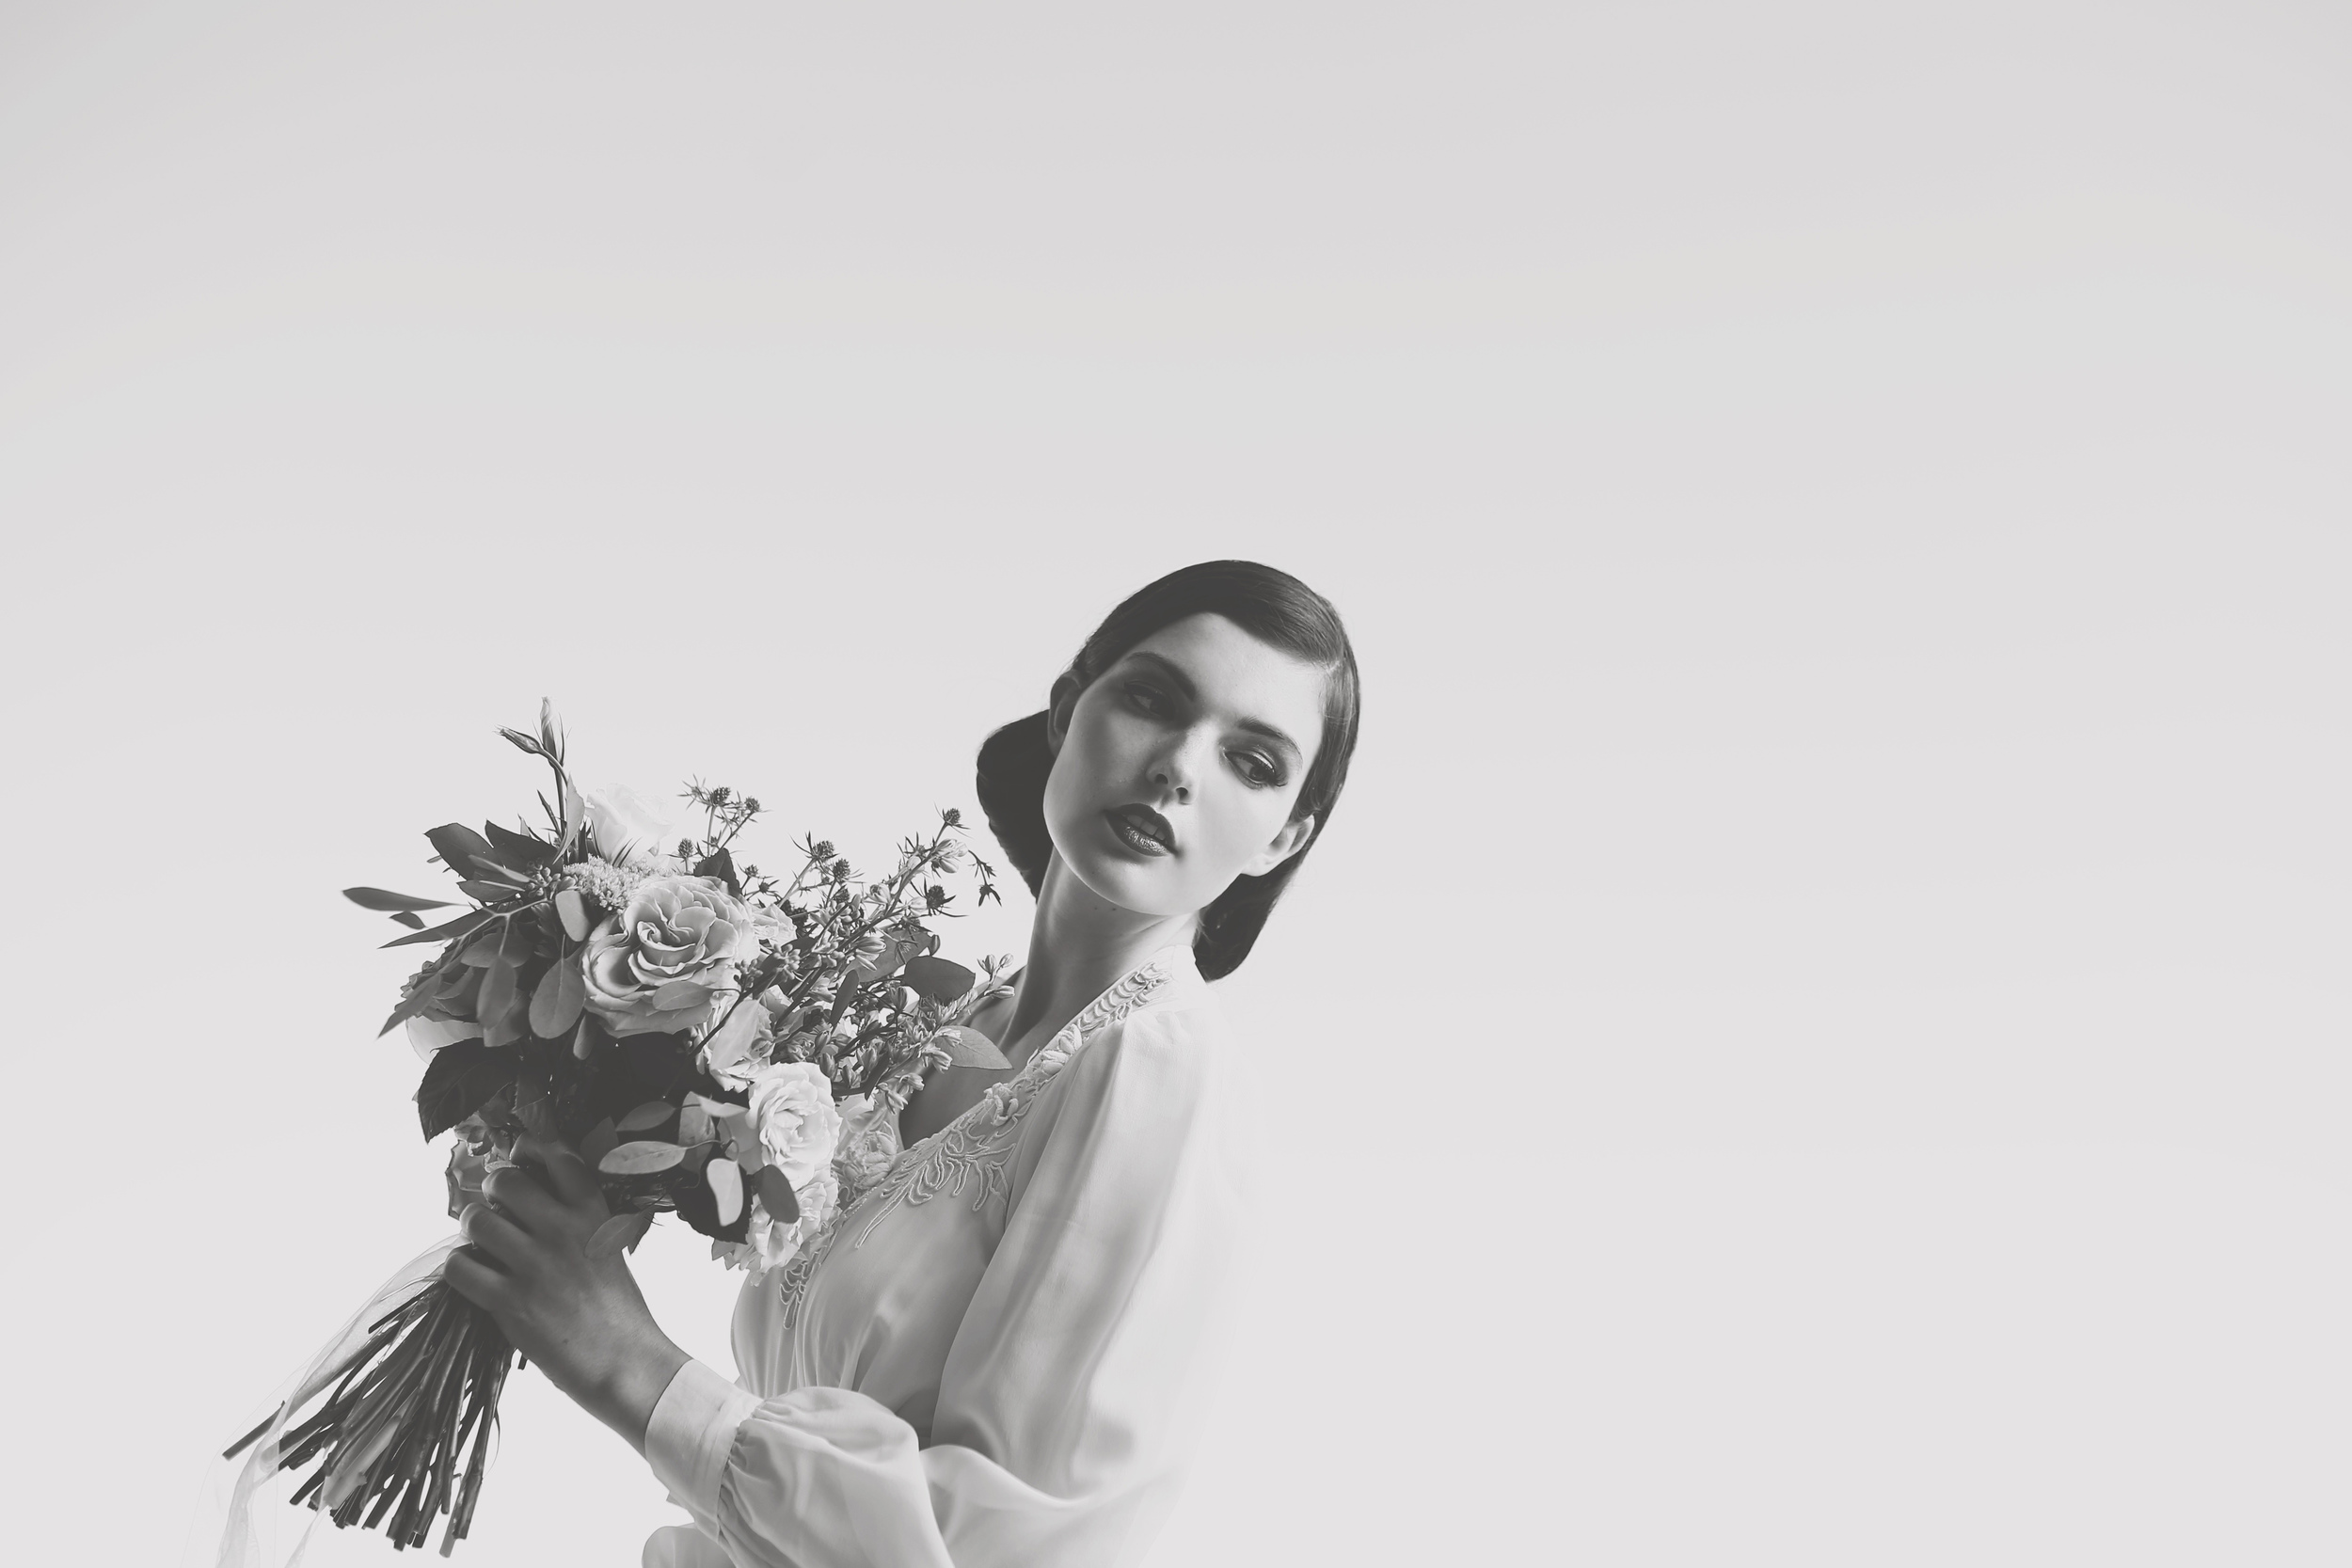 bridal editorial, jennifer picard photography, sigma 35mm 1.4 art series lens, vancouver wedding photographer